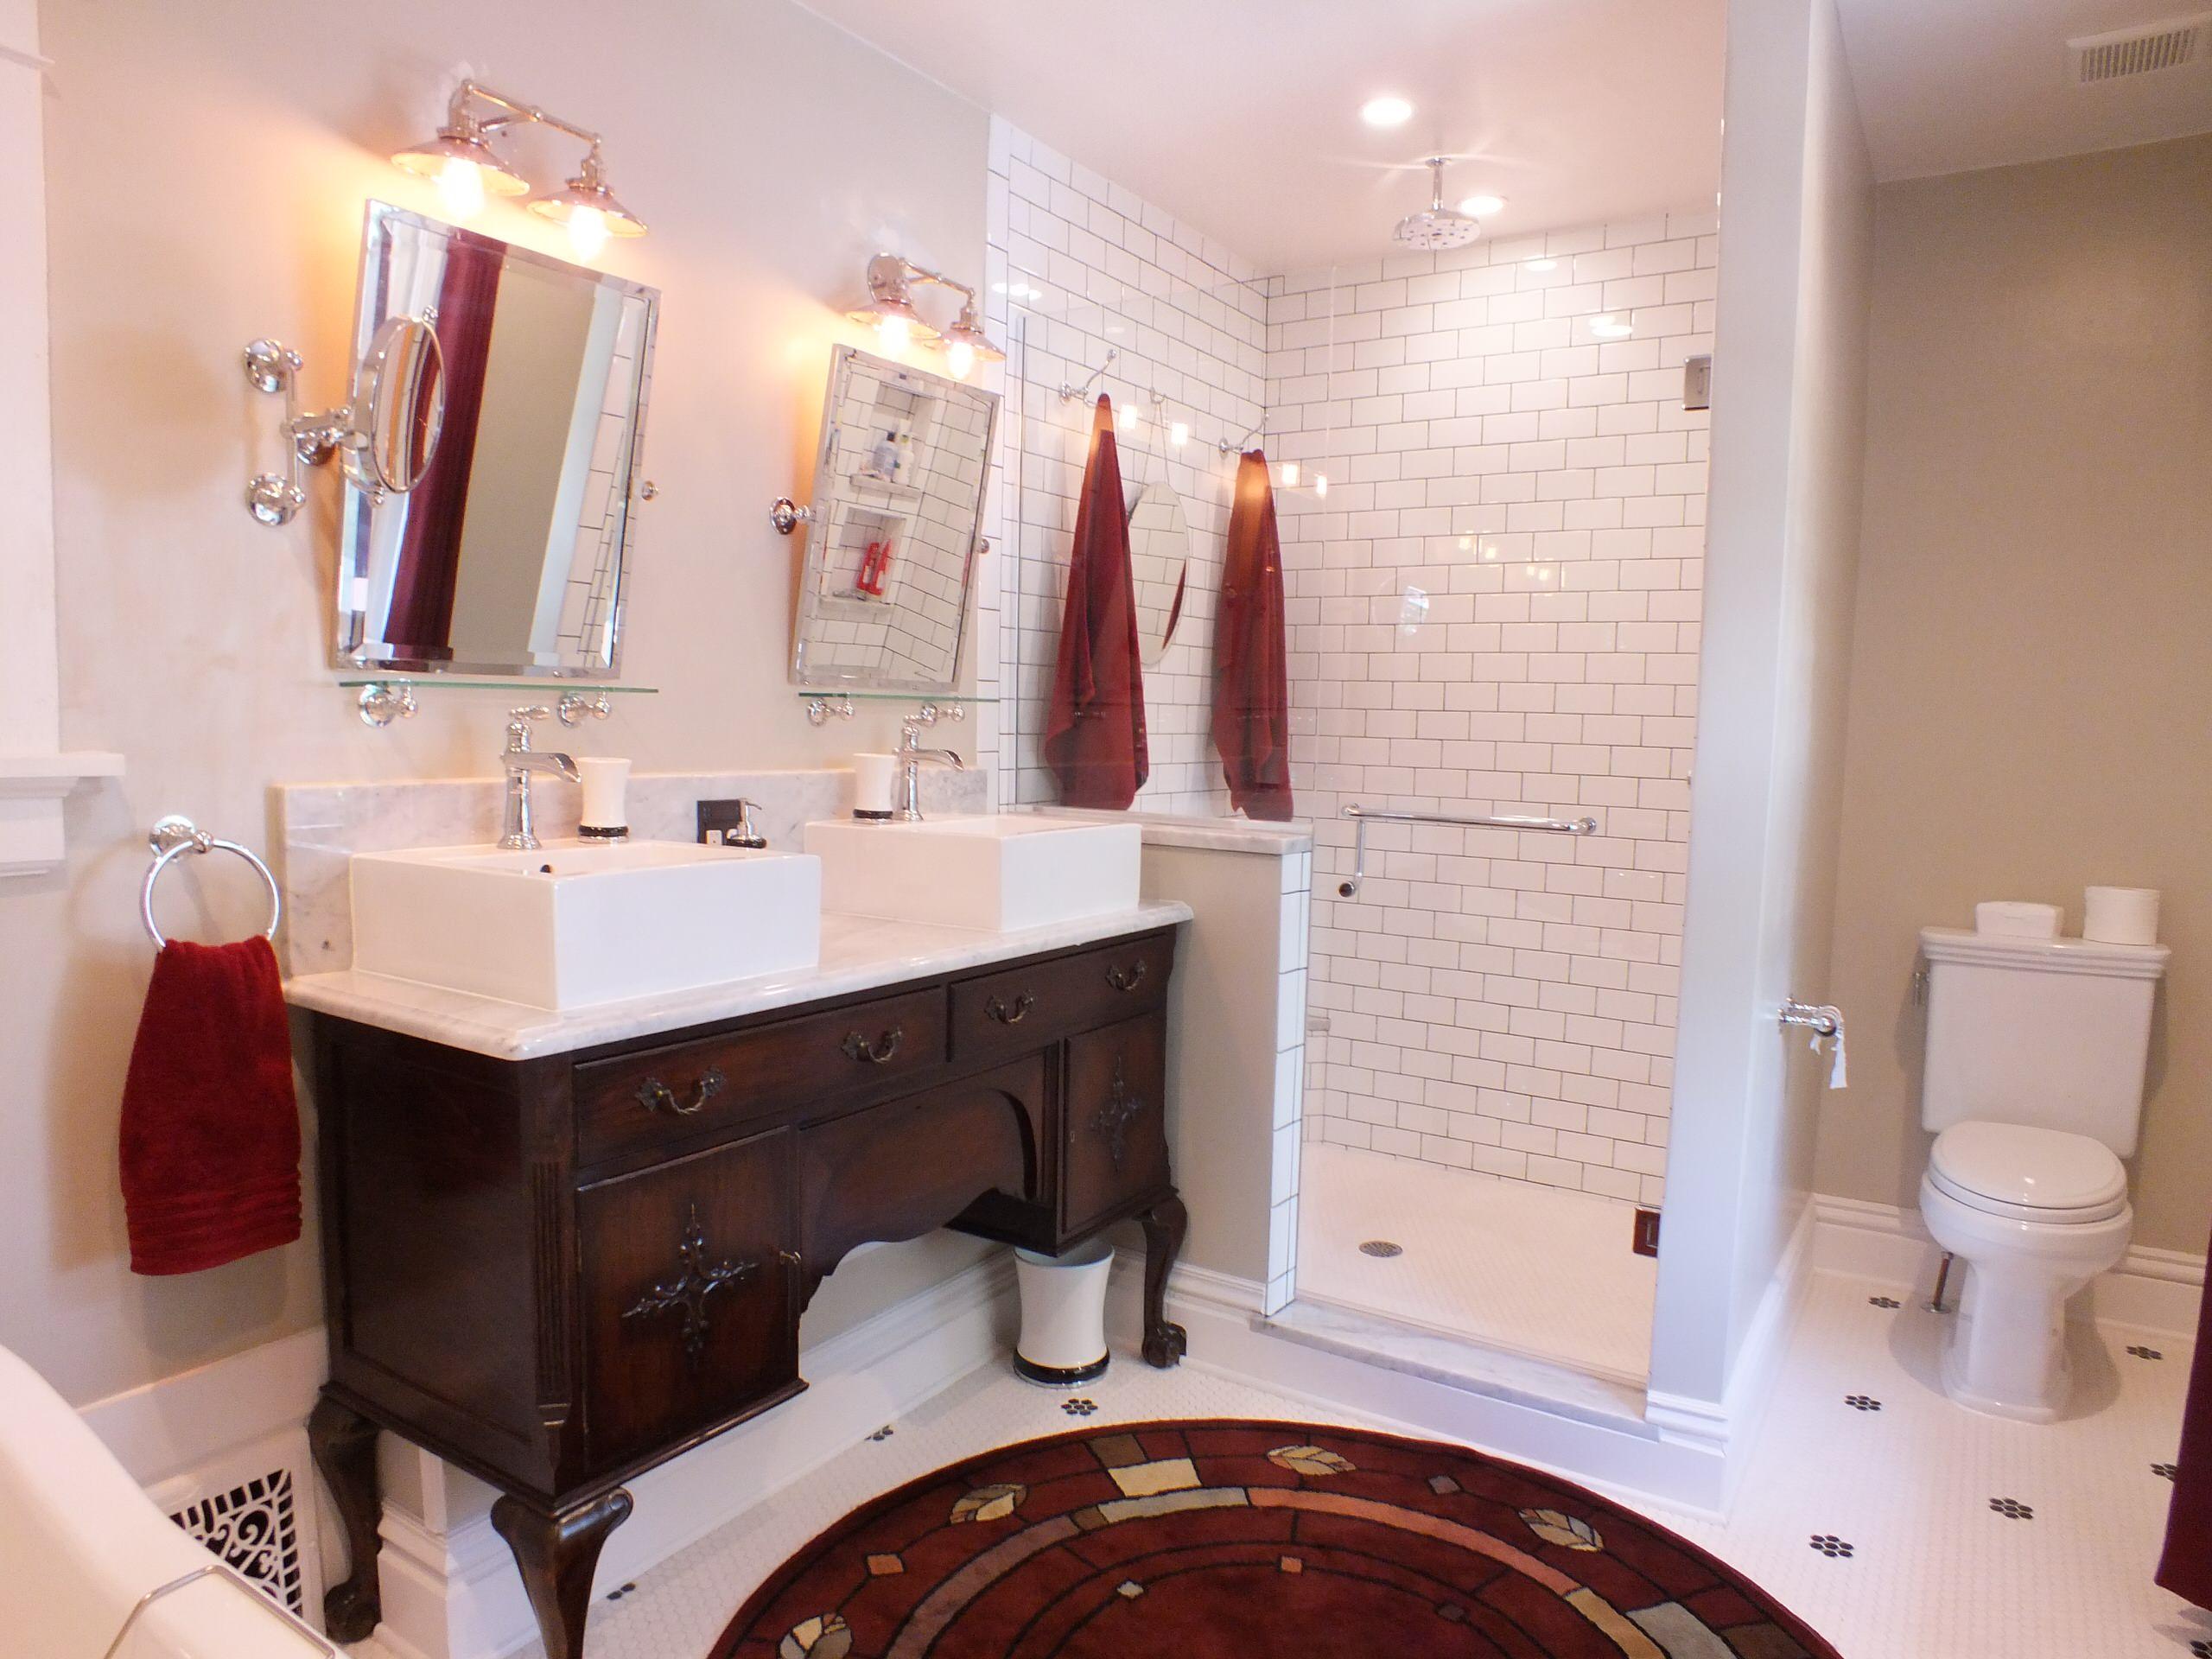 Congress Park Classic Master Bath and Kitchen